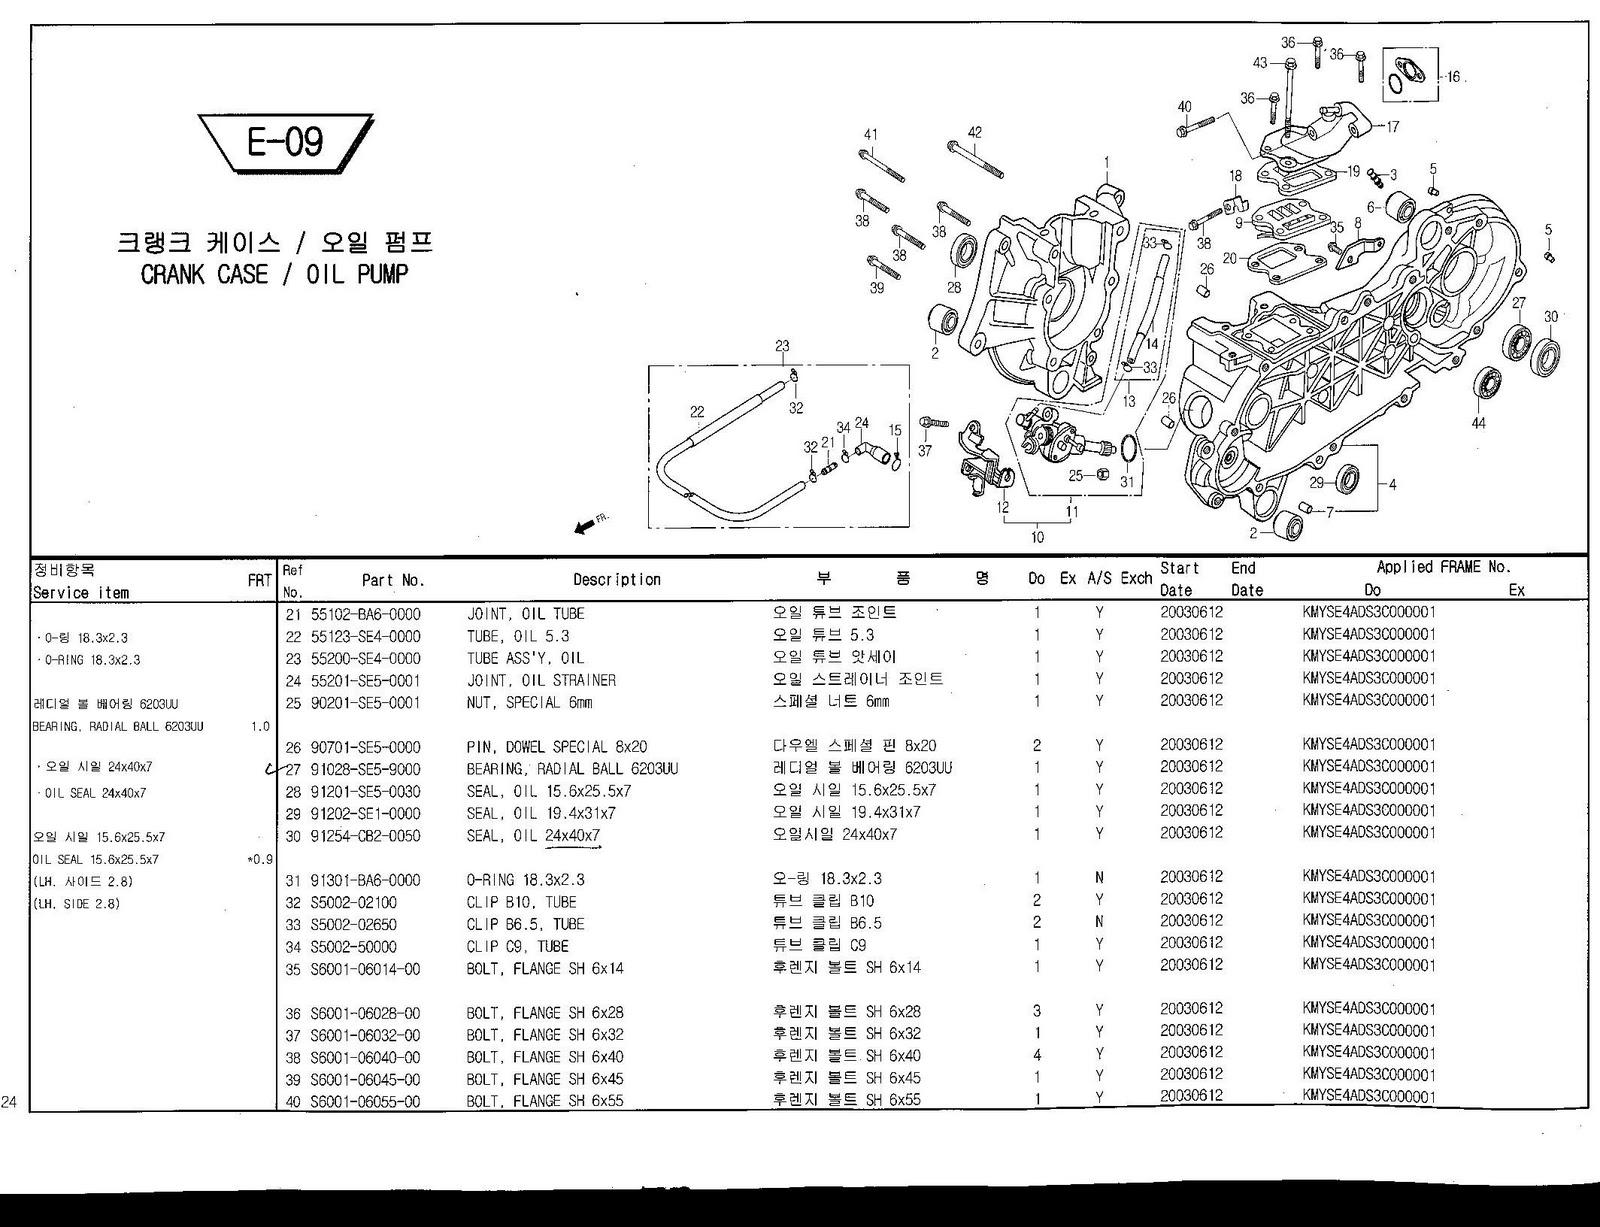 Kazuma 4 Wheeler Wiring Diagram Great Design Of 50cc Engine Falcon 250 Parts And Fuse Box Chinese Atv Diagrams